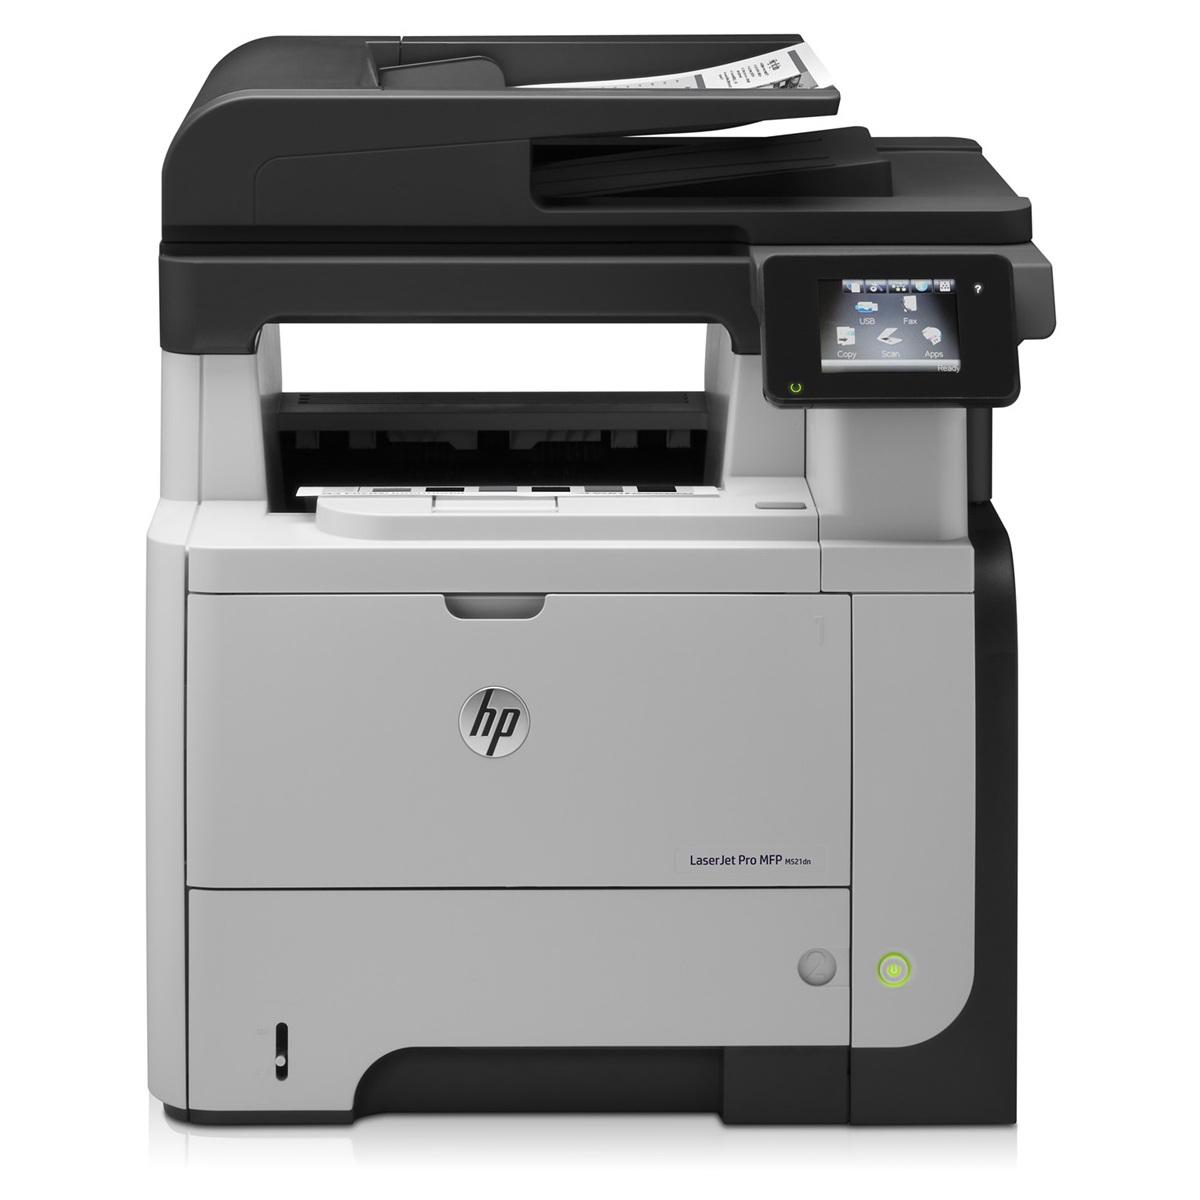 Imprimante multifonction HP LaserJet Pro M521dn Imprimante multifonction laser monochrome (USB 2.0 / Ethernet)